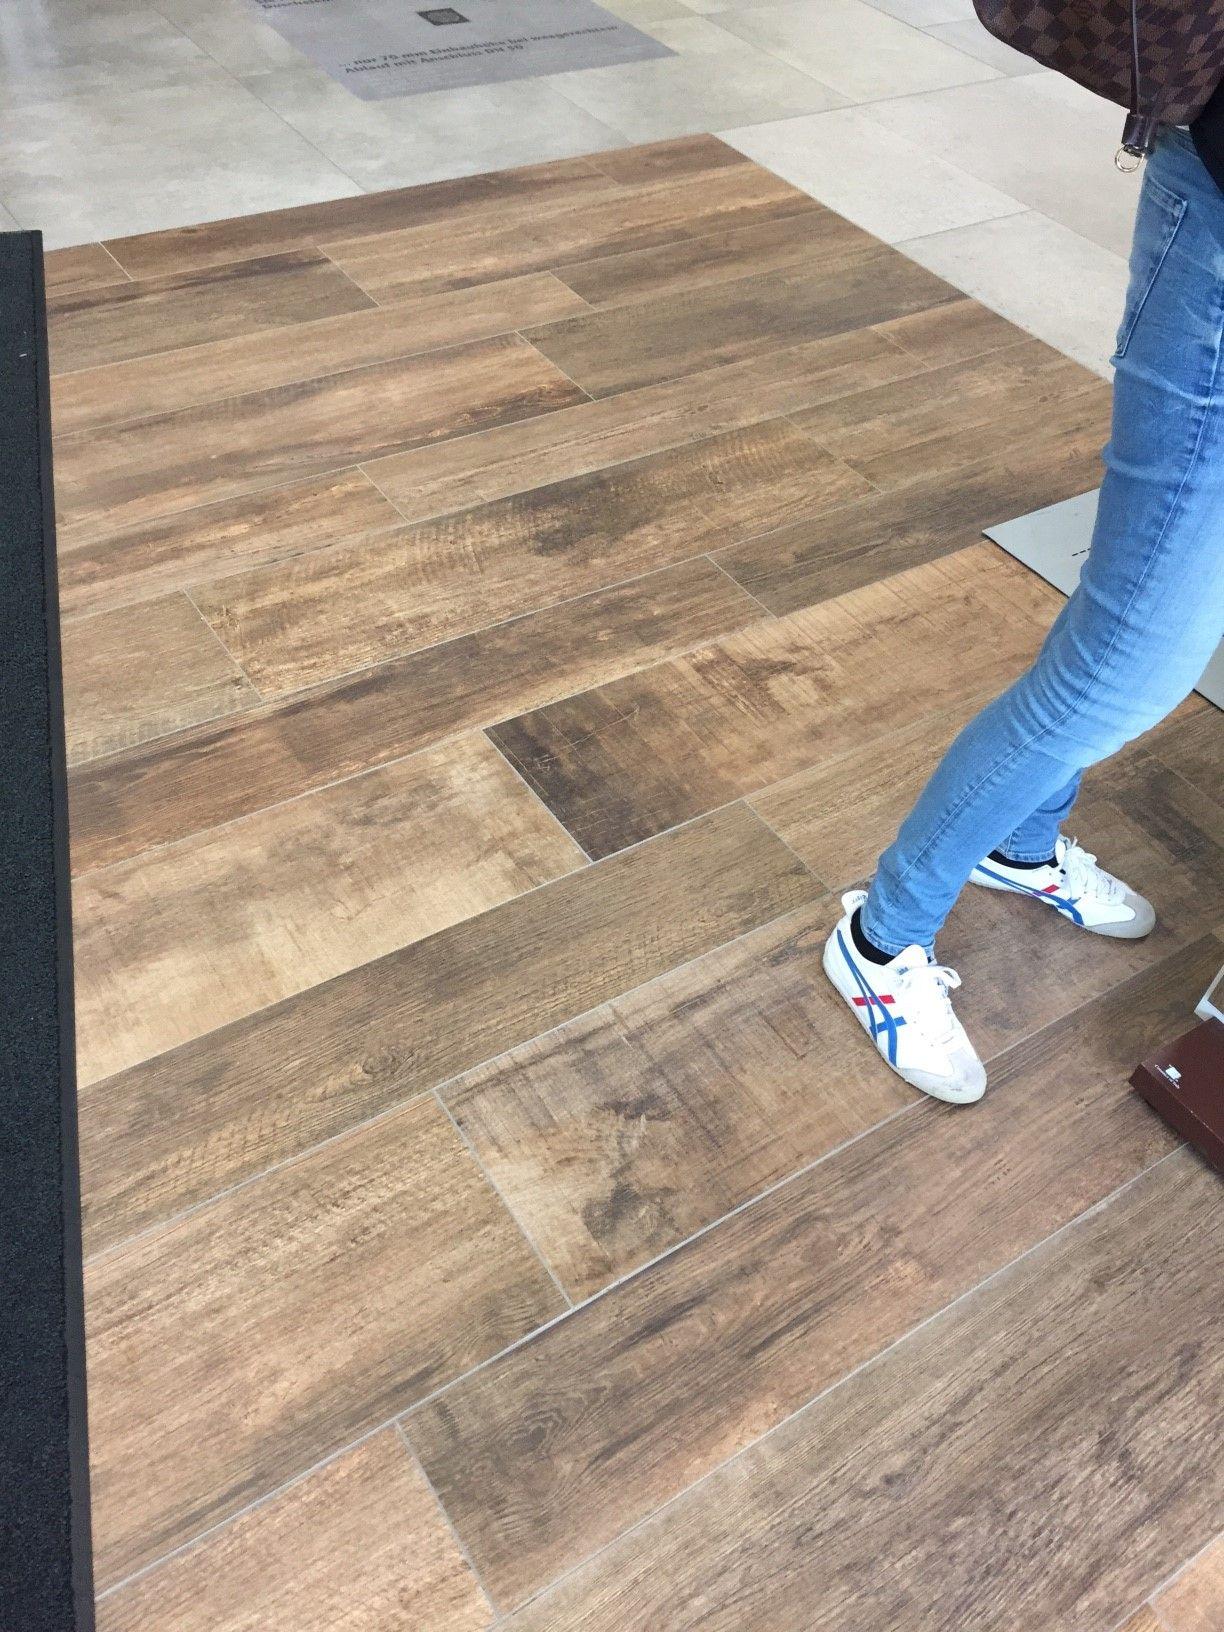 sch ner fu boden serenissima norway beautiful shade bodenfliese 30x120 preis je qm 45 50eur. Black Bedroom Furniture Sets. Home Design Ideas